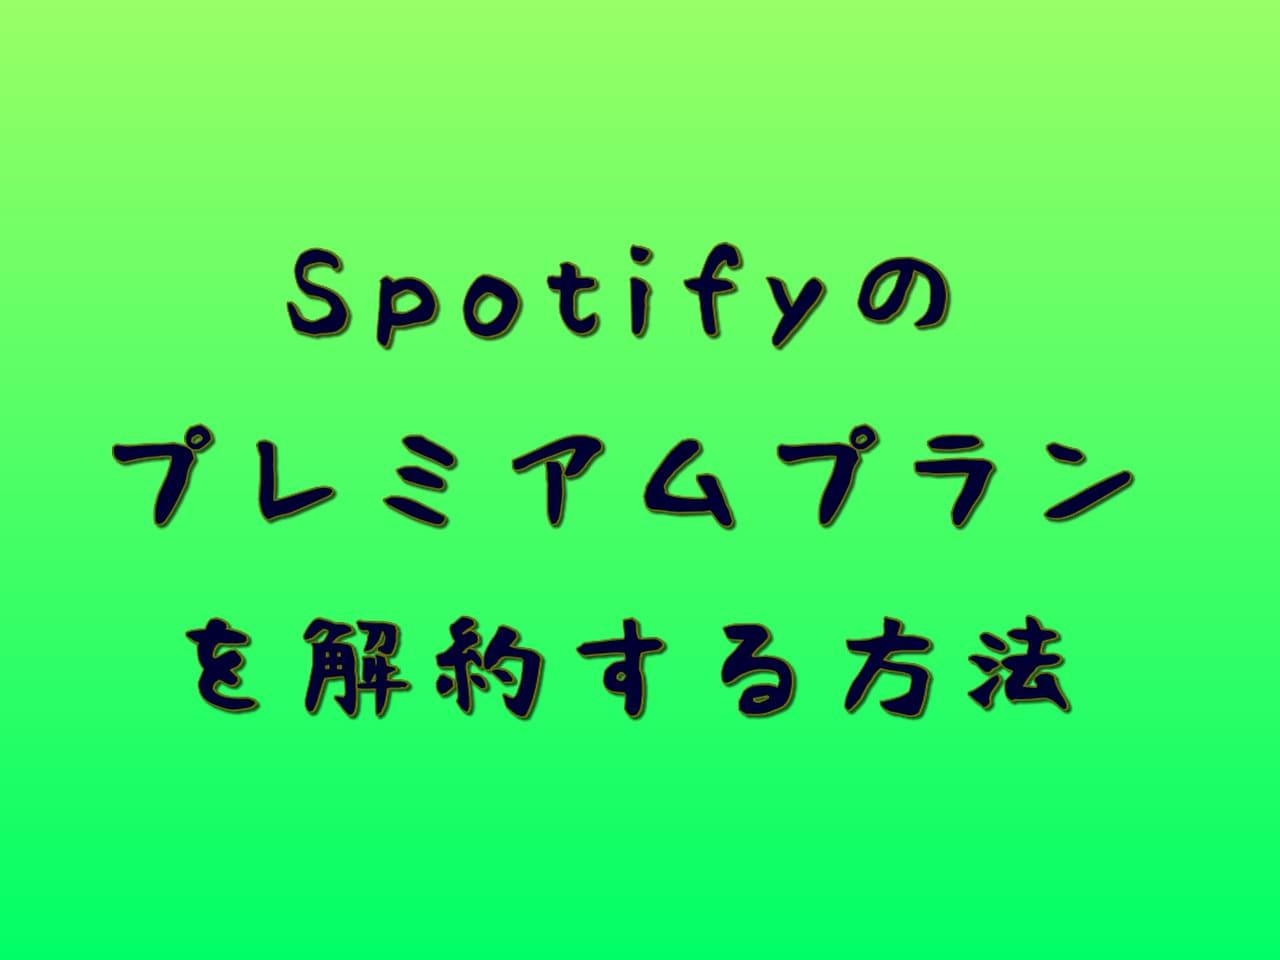 Spotifyの有料プラン(プレミアムプラン)を解約する方法